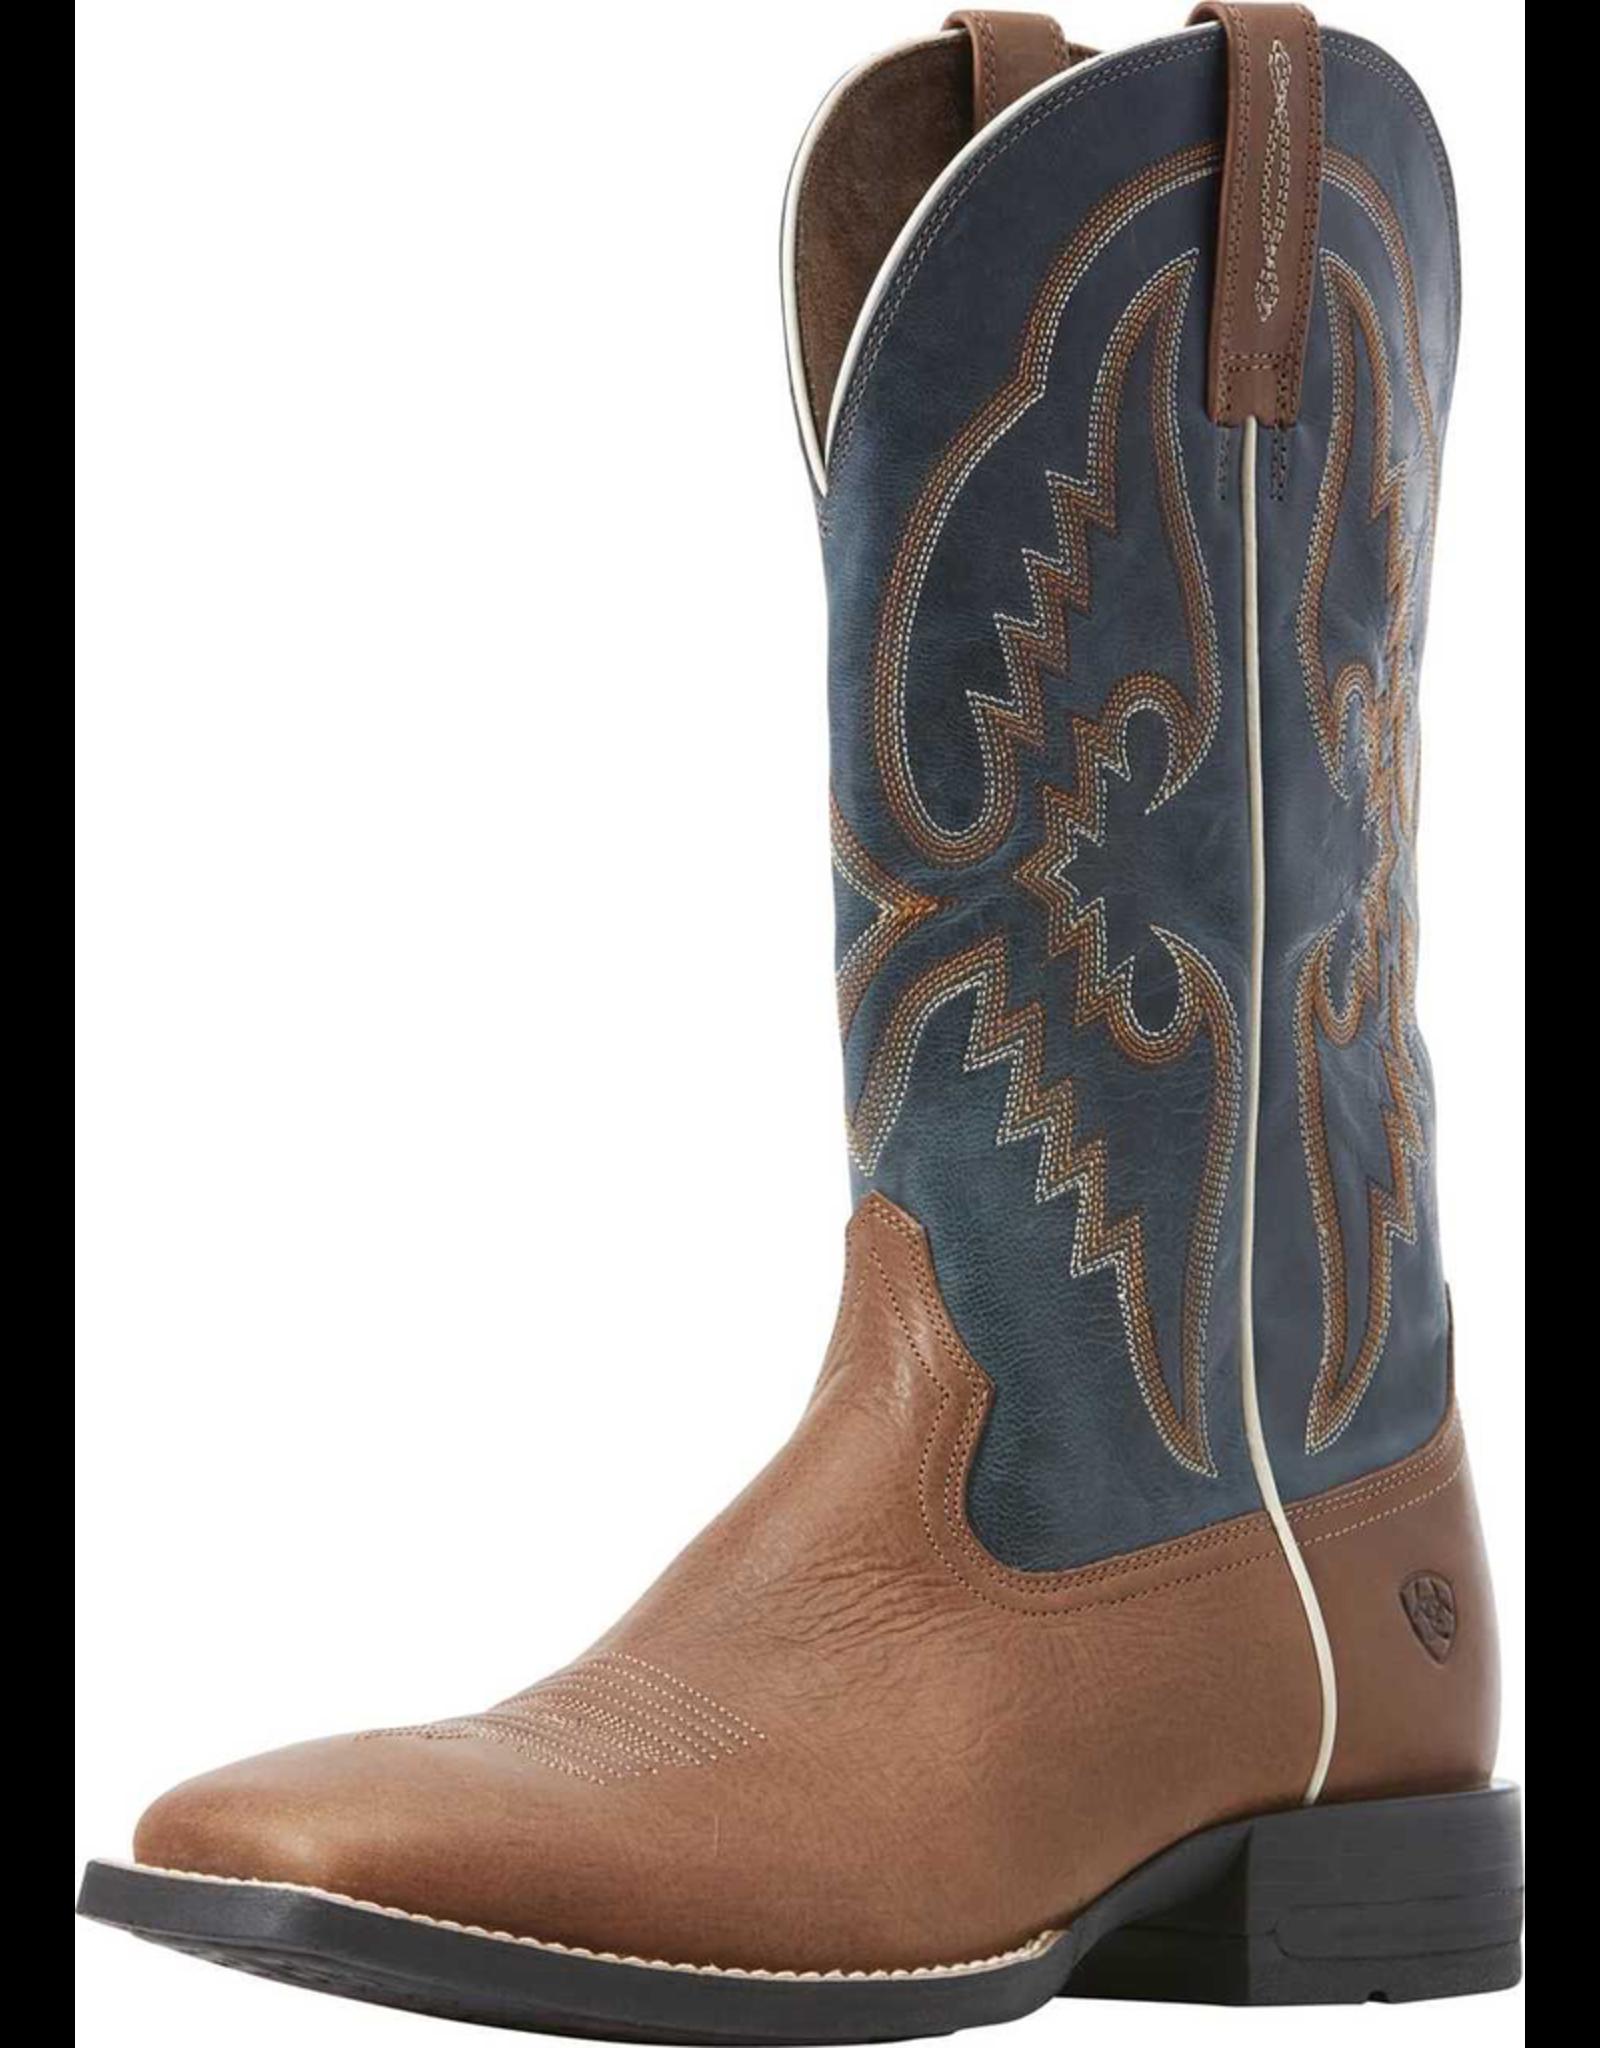 Boots-Men Ariat 10029690  Round Pen